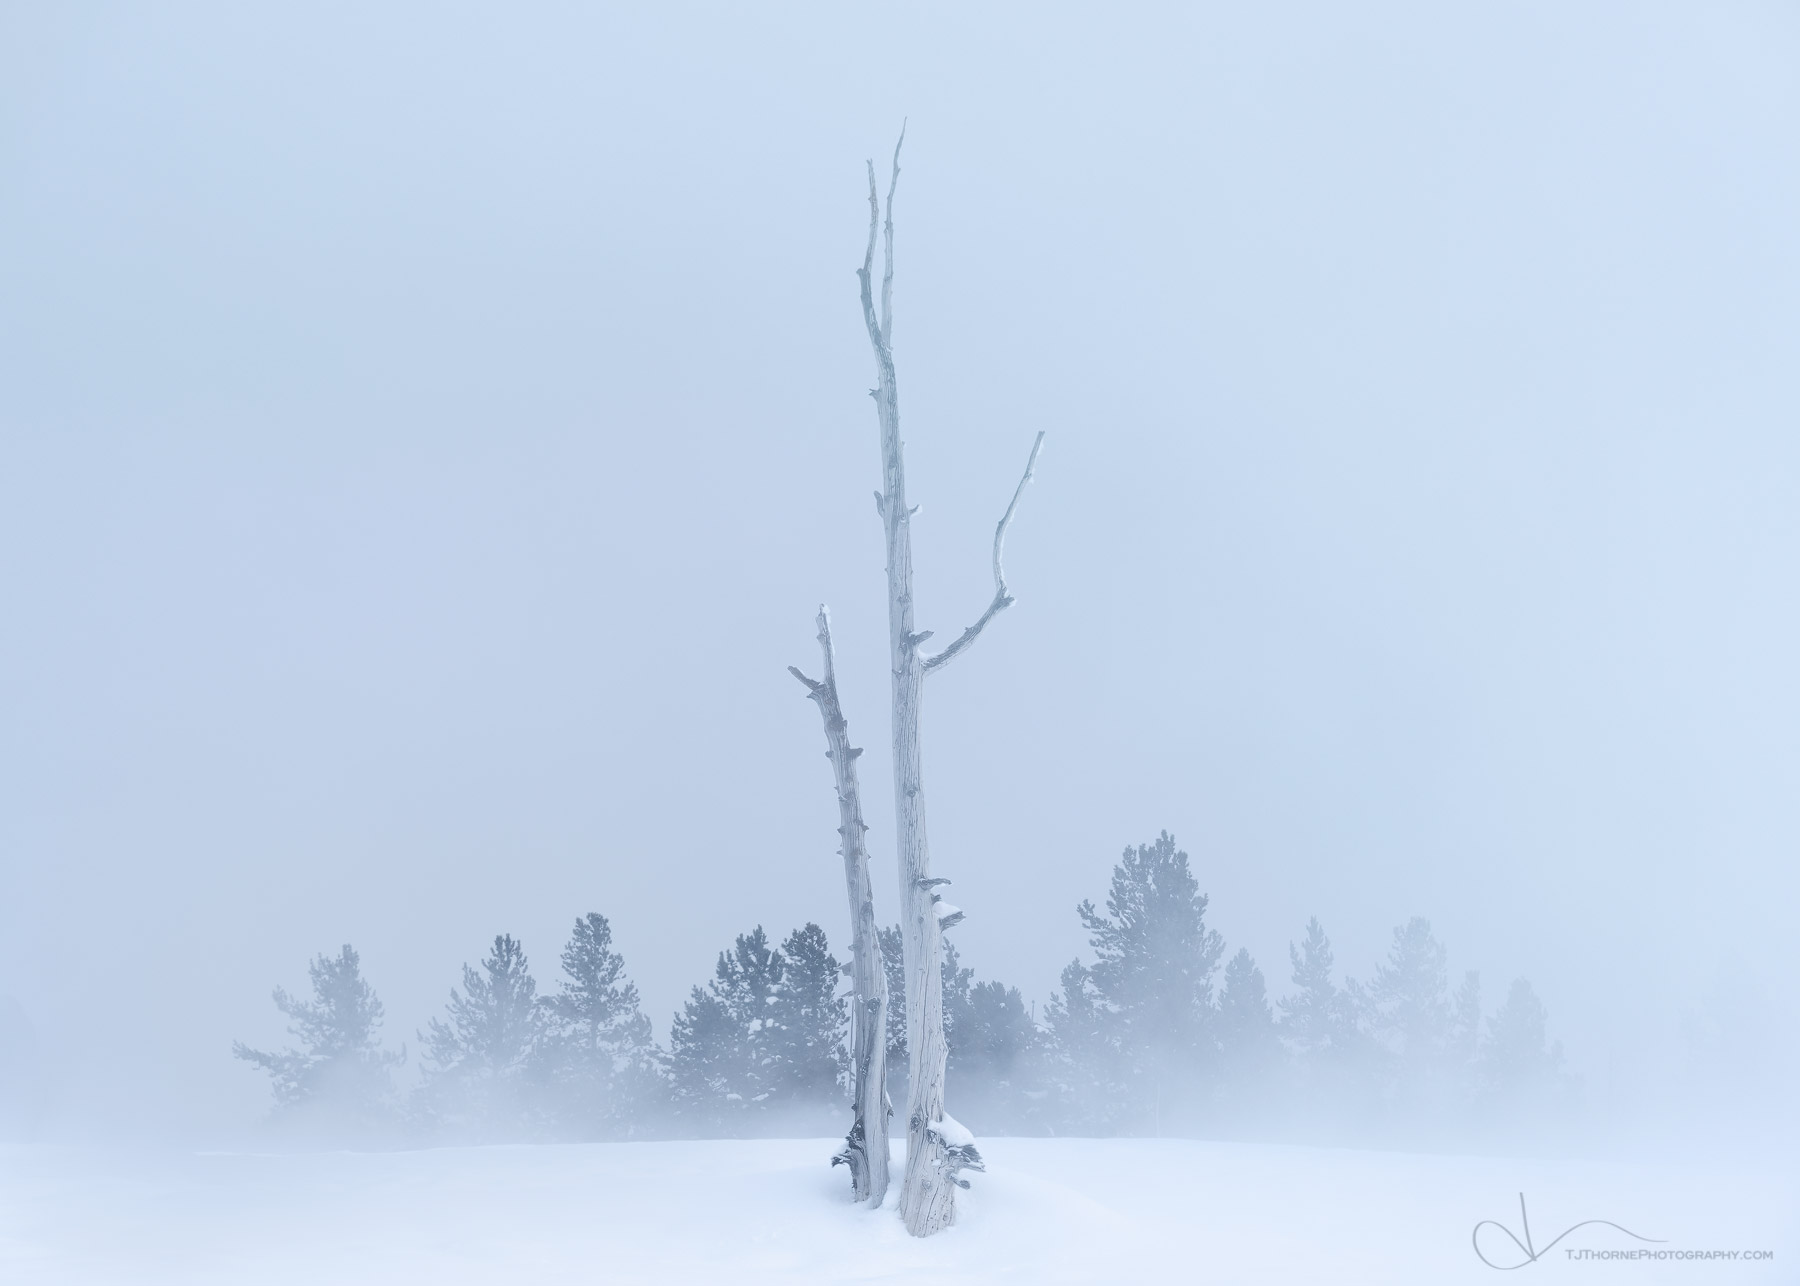 yellowstone, wyoming, trees, snow, steam, winter, geyser , photo